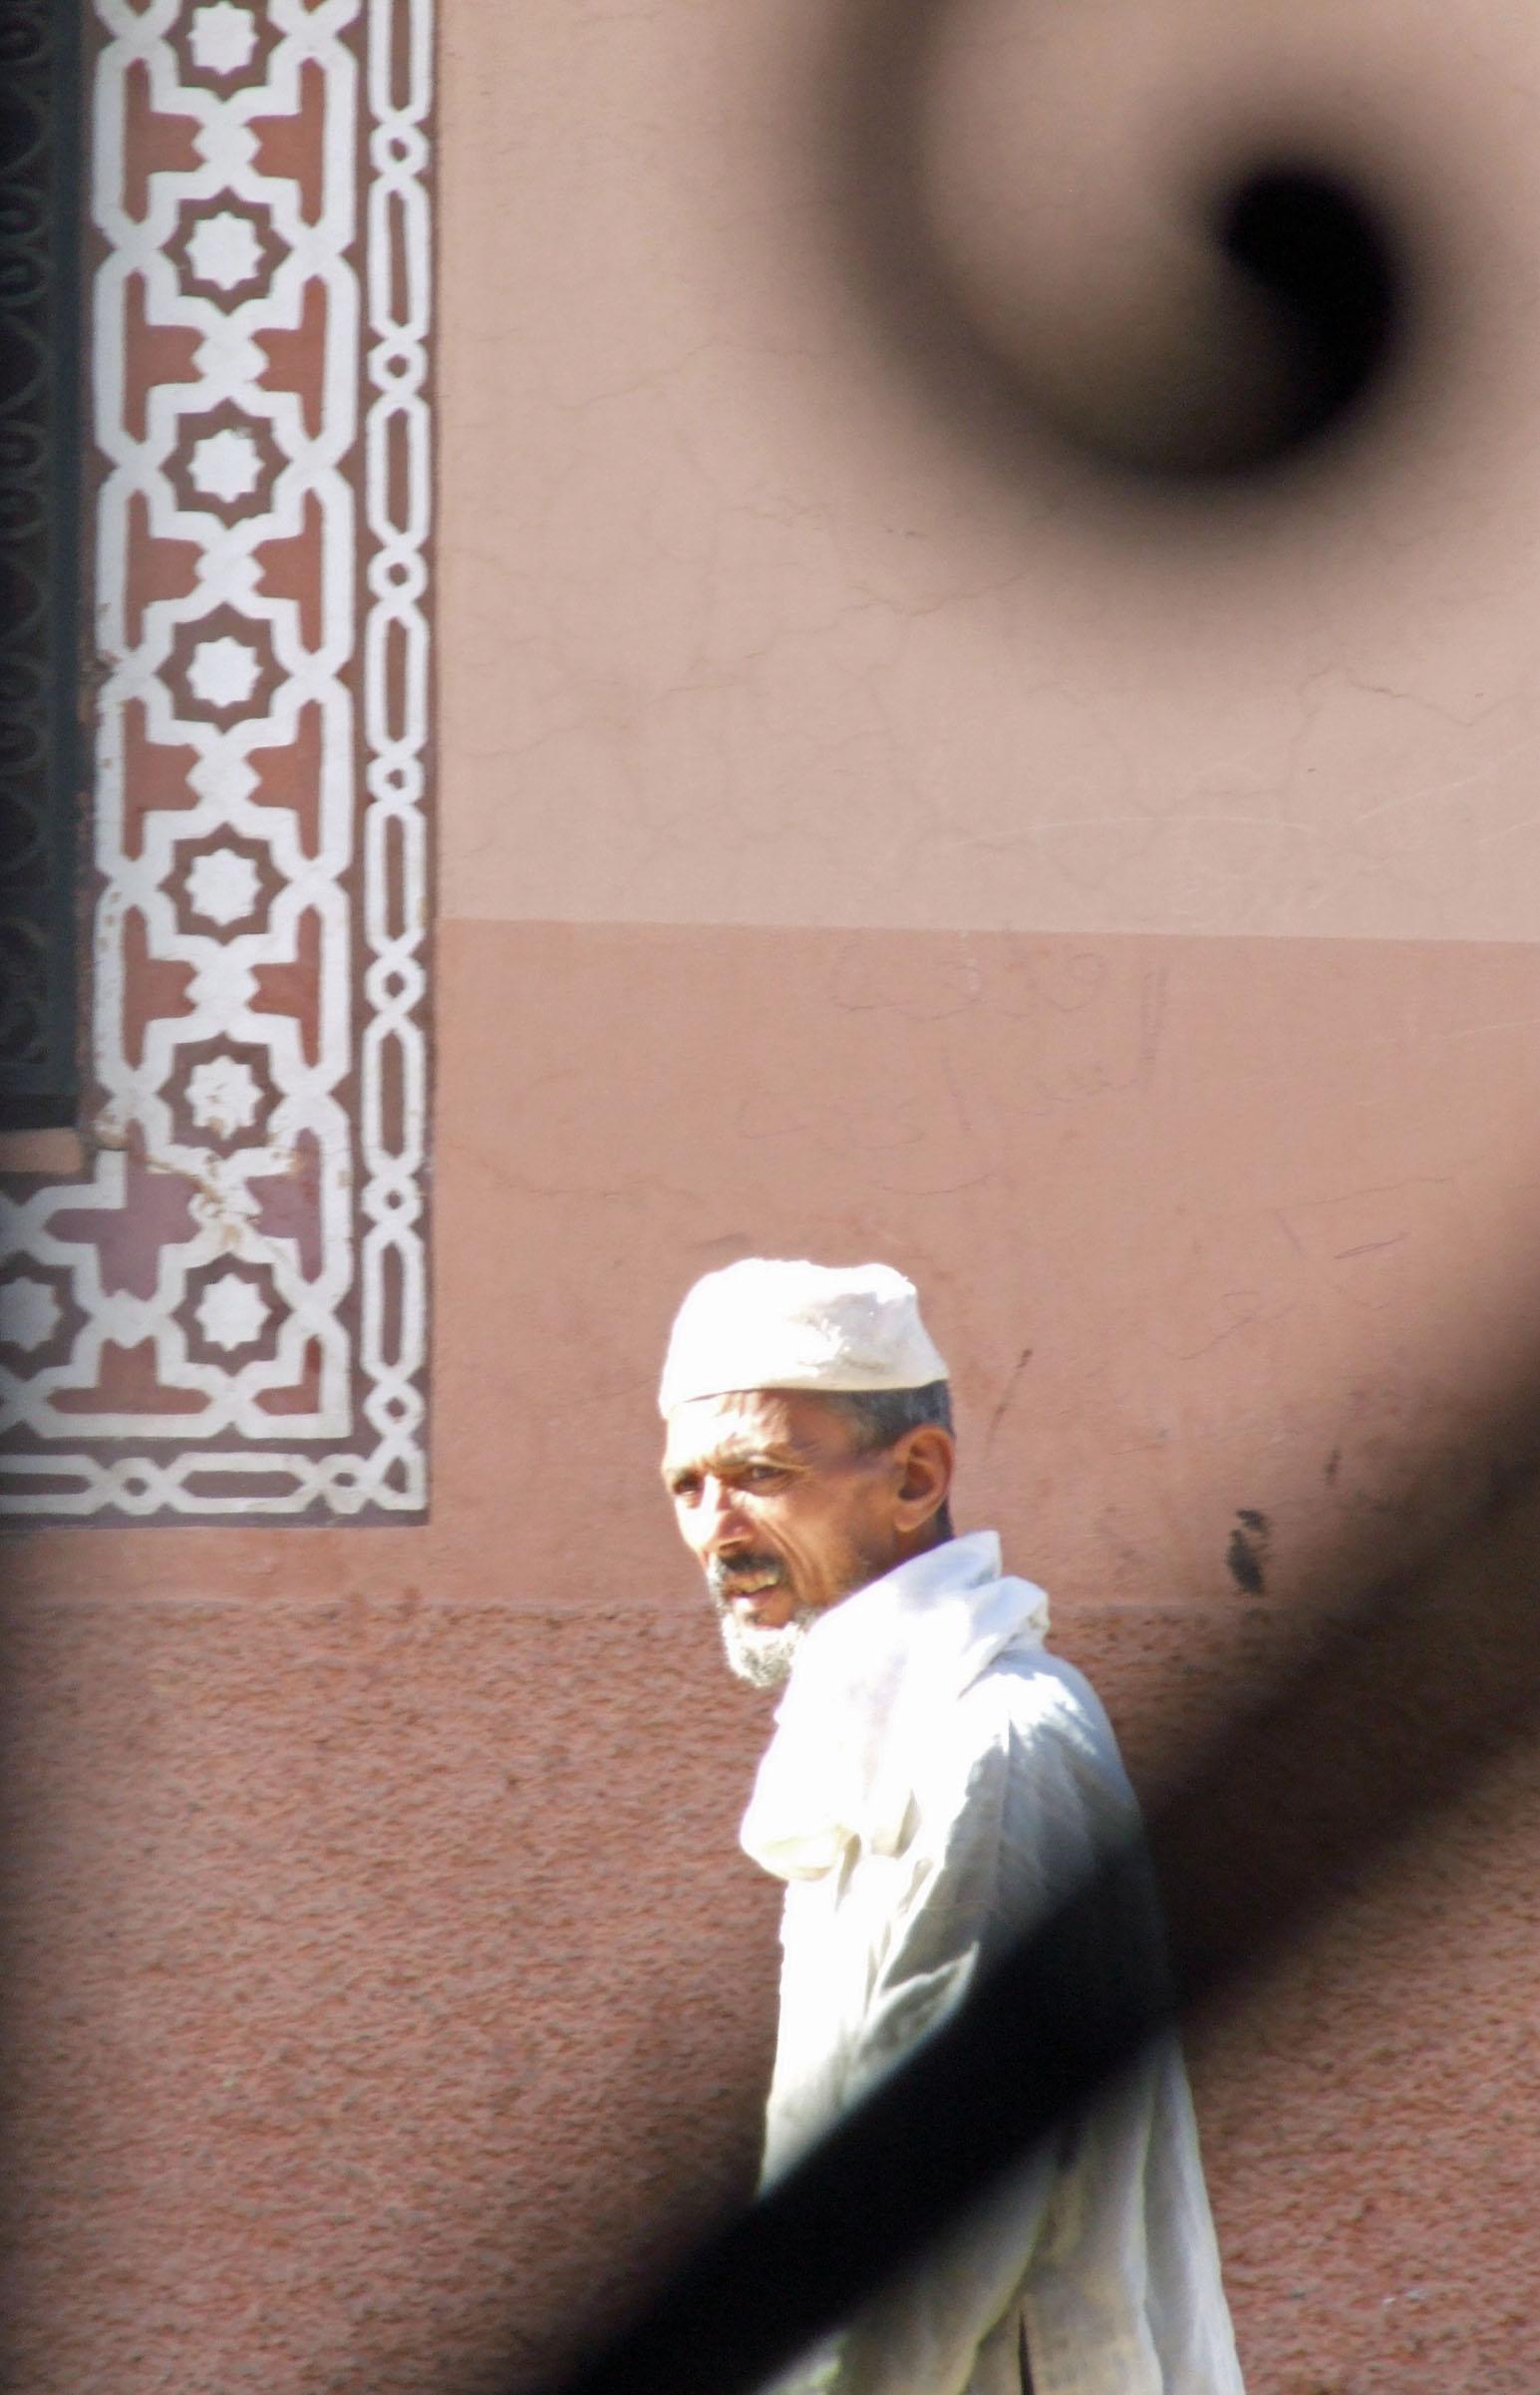 Man in white robe seen through ornate railing